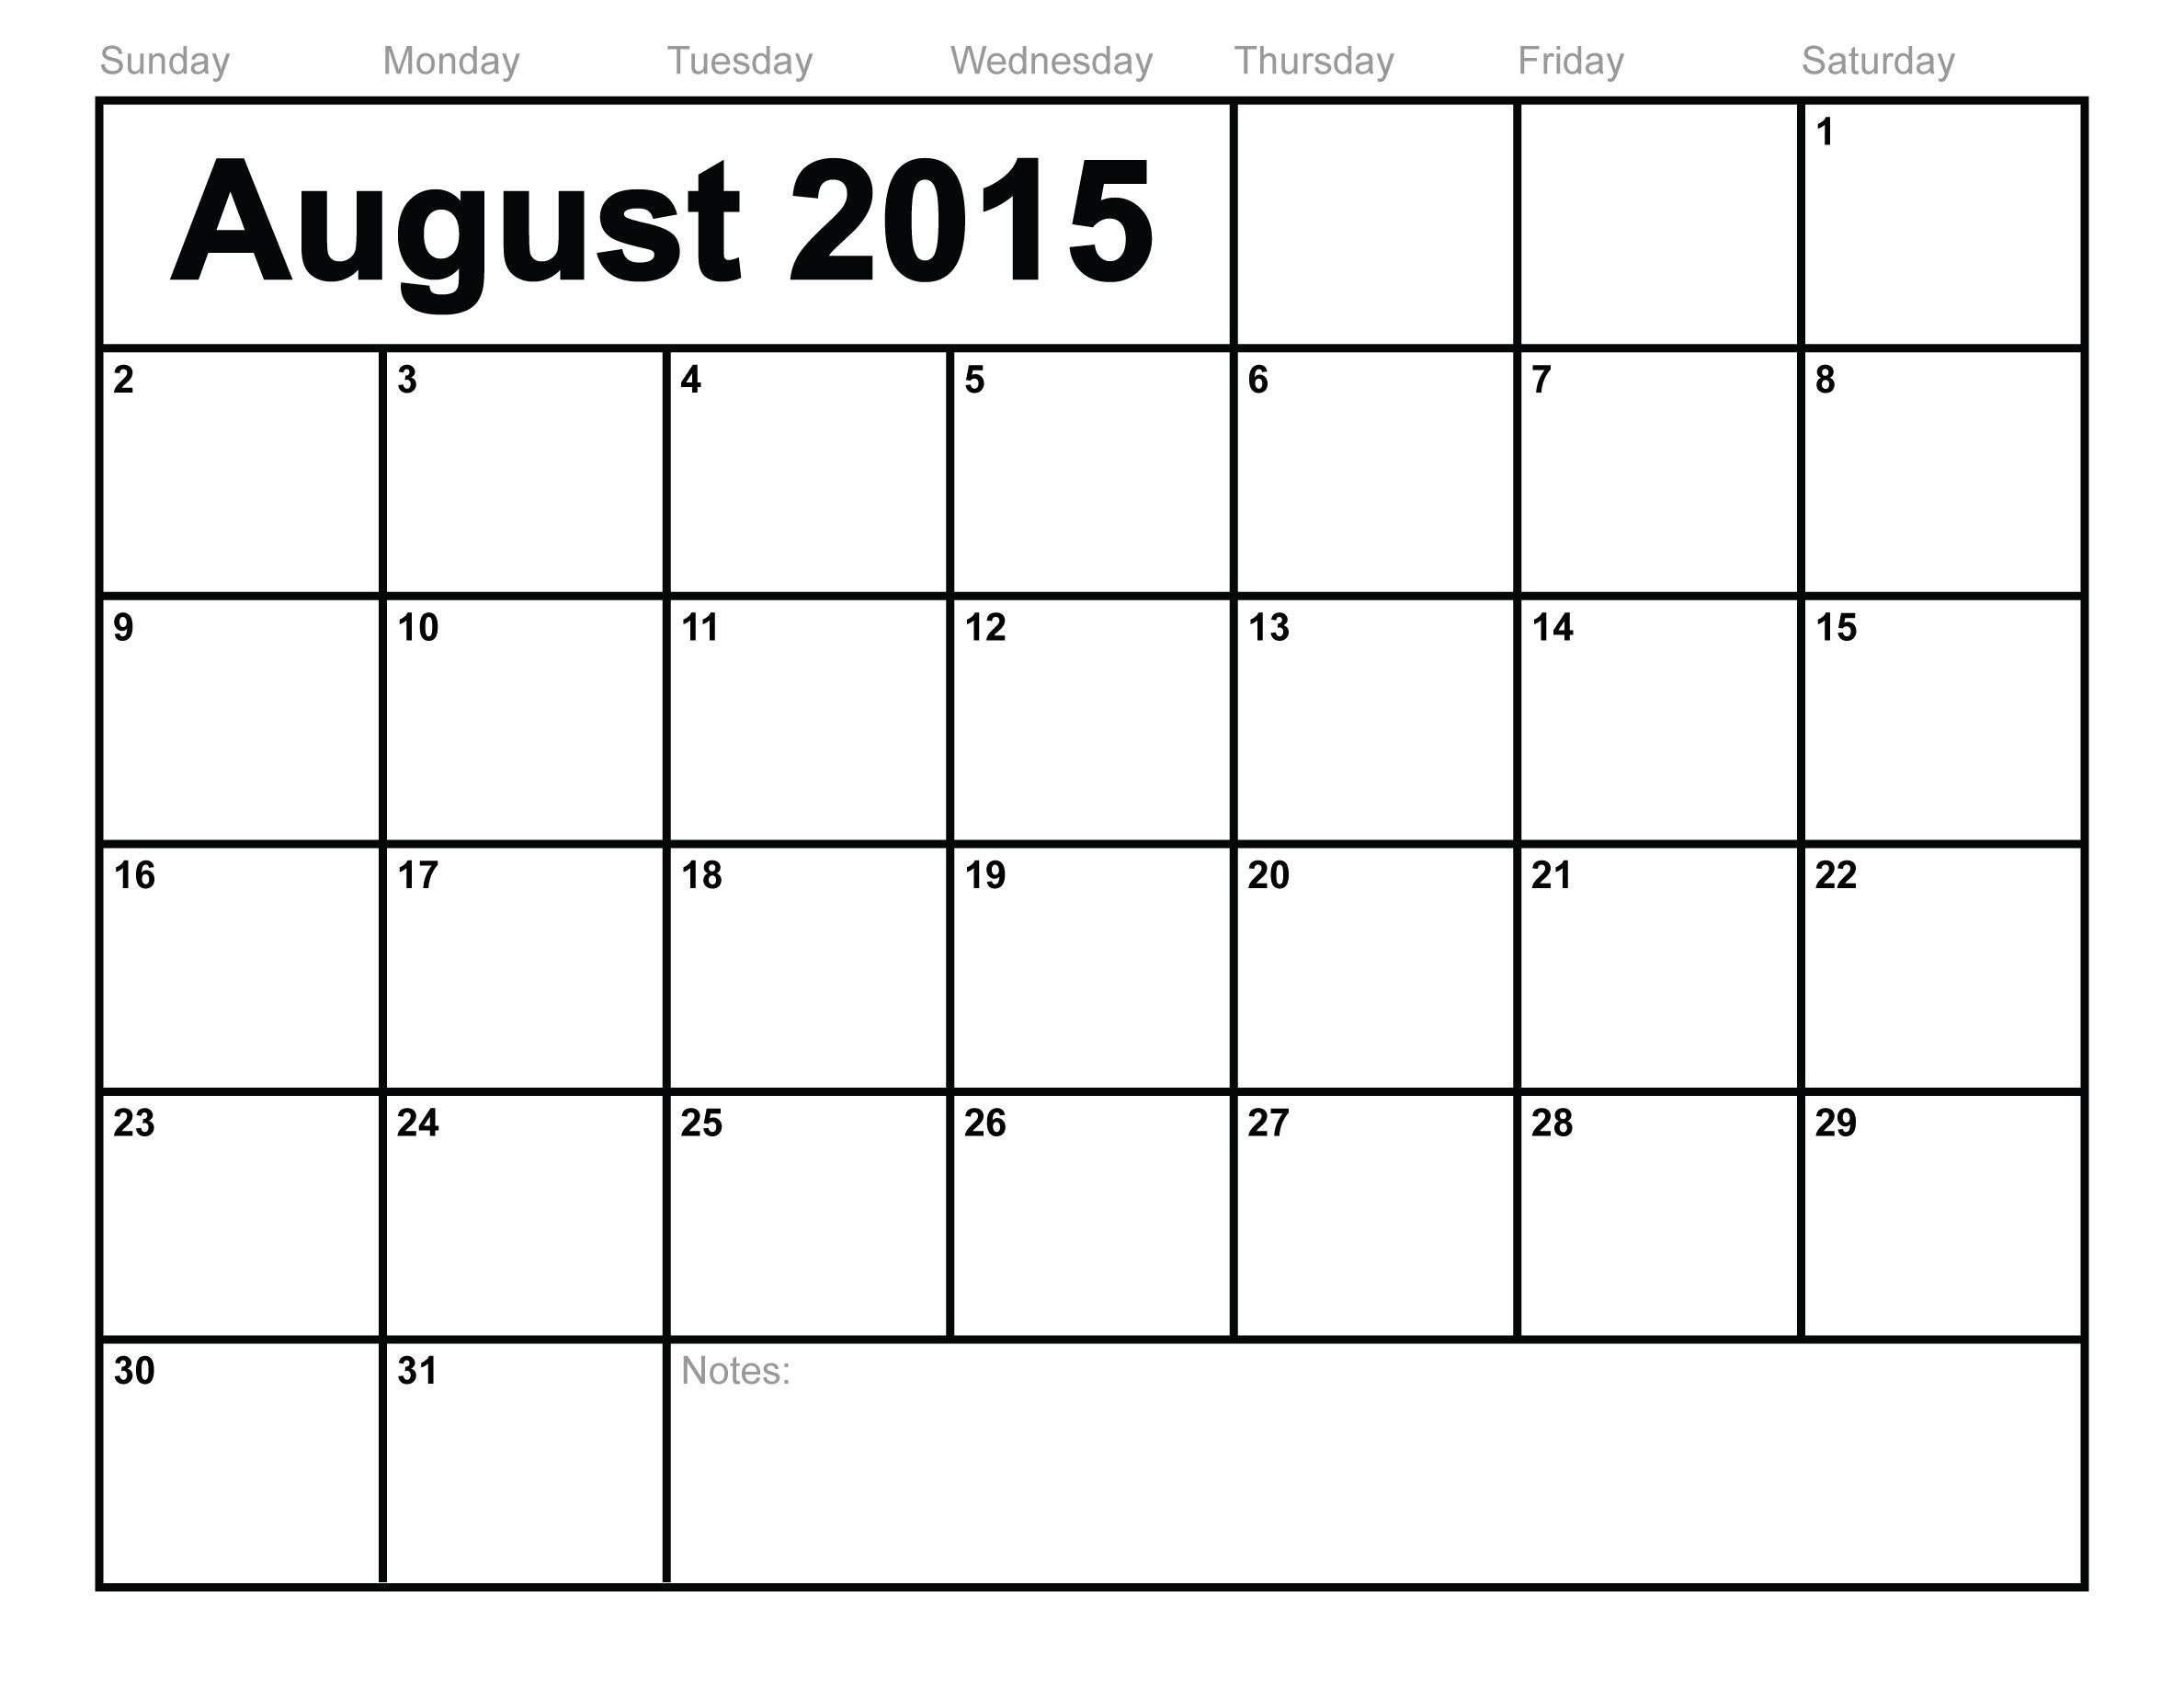 August 2015 Calendar Printable Template (10 Templates)